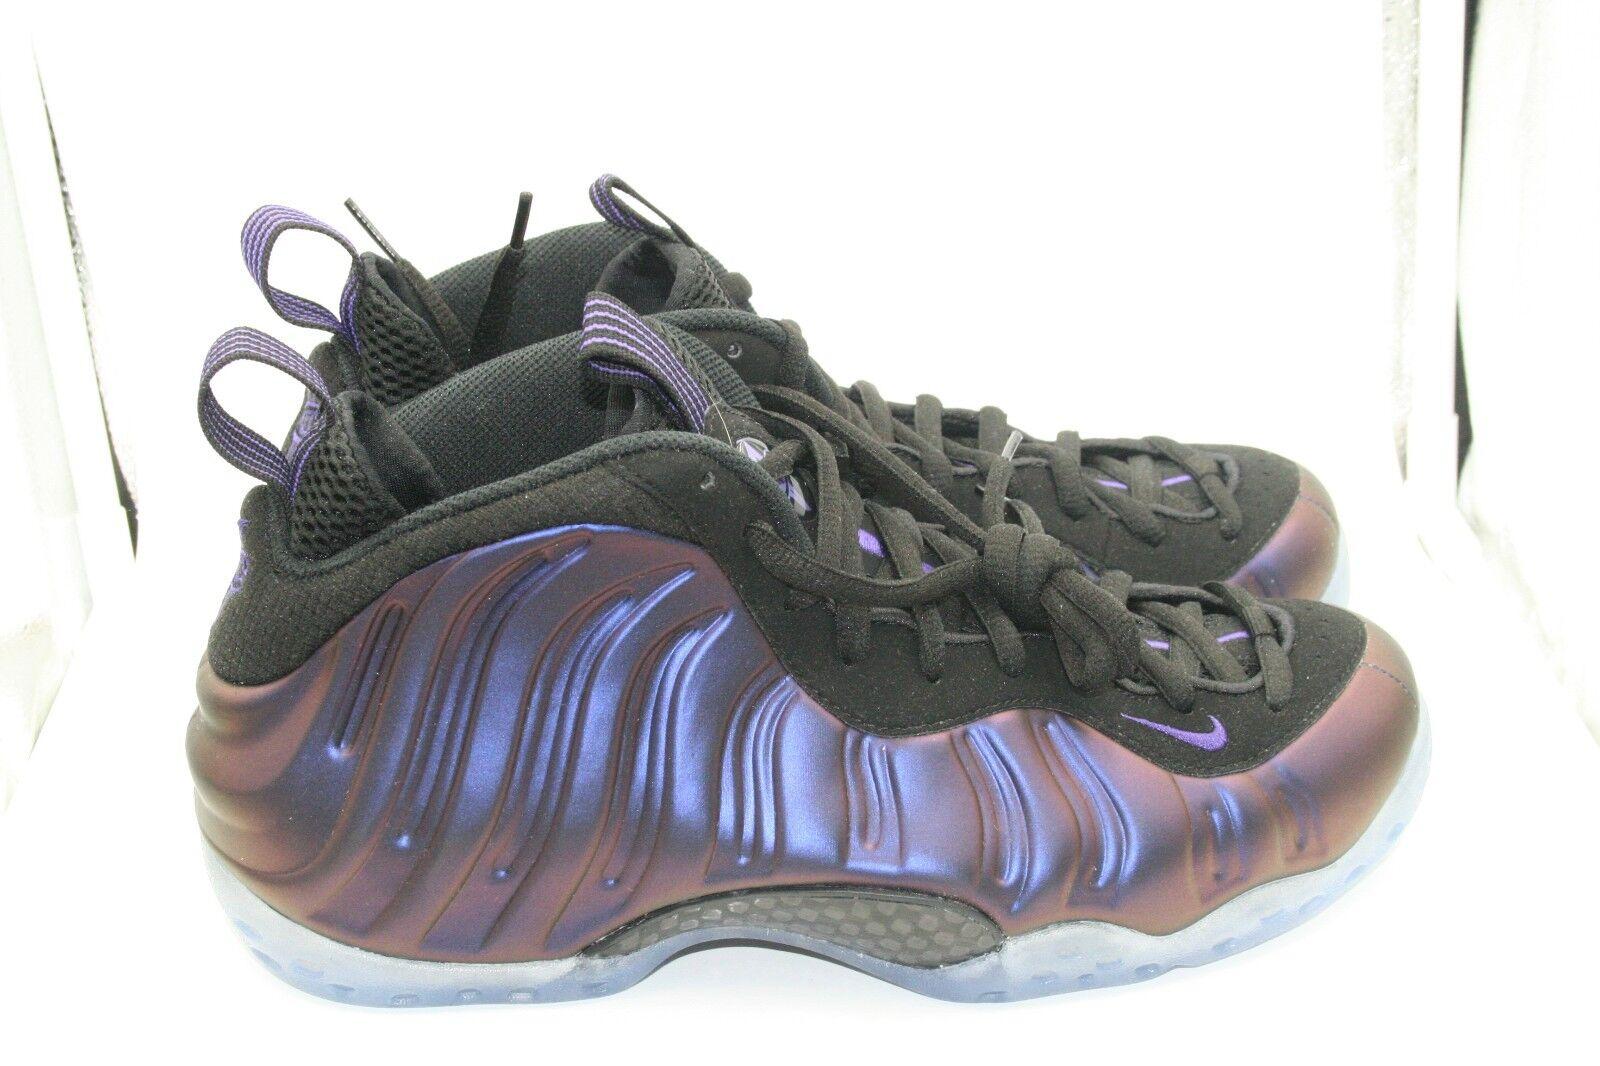 Nike Foamposite One Eggplant DS Sz 9 W Receipt Black Varsity Purple Penny